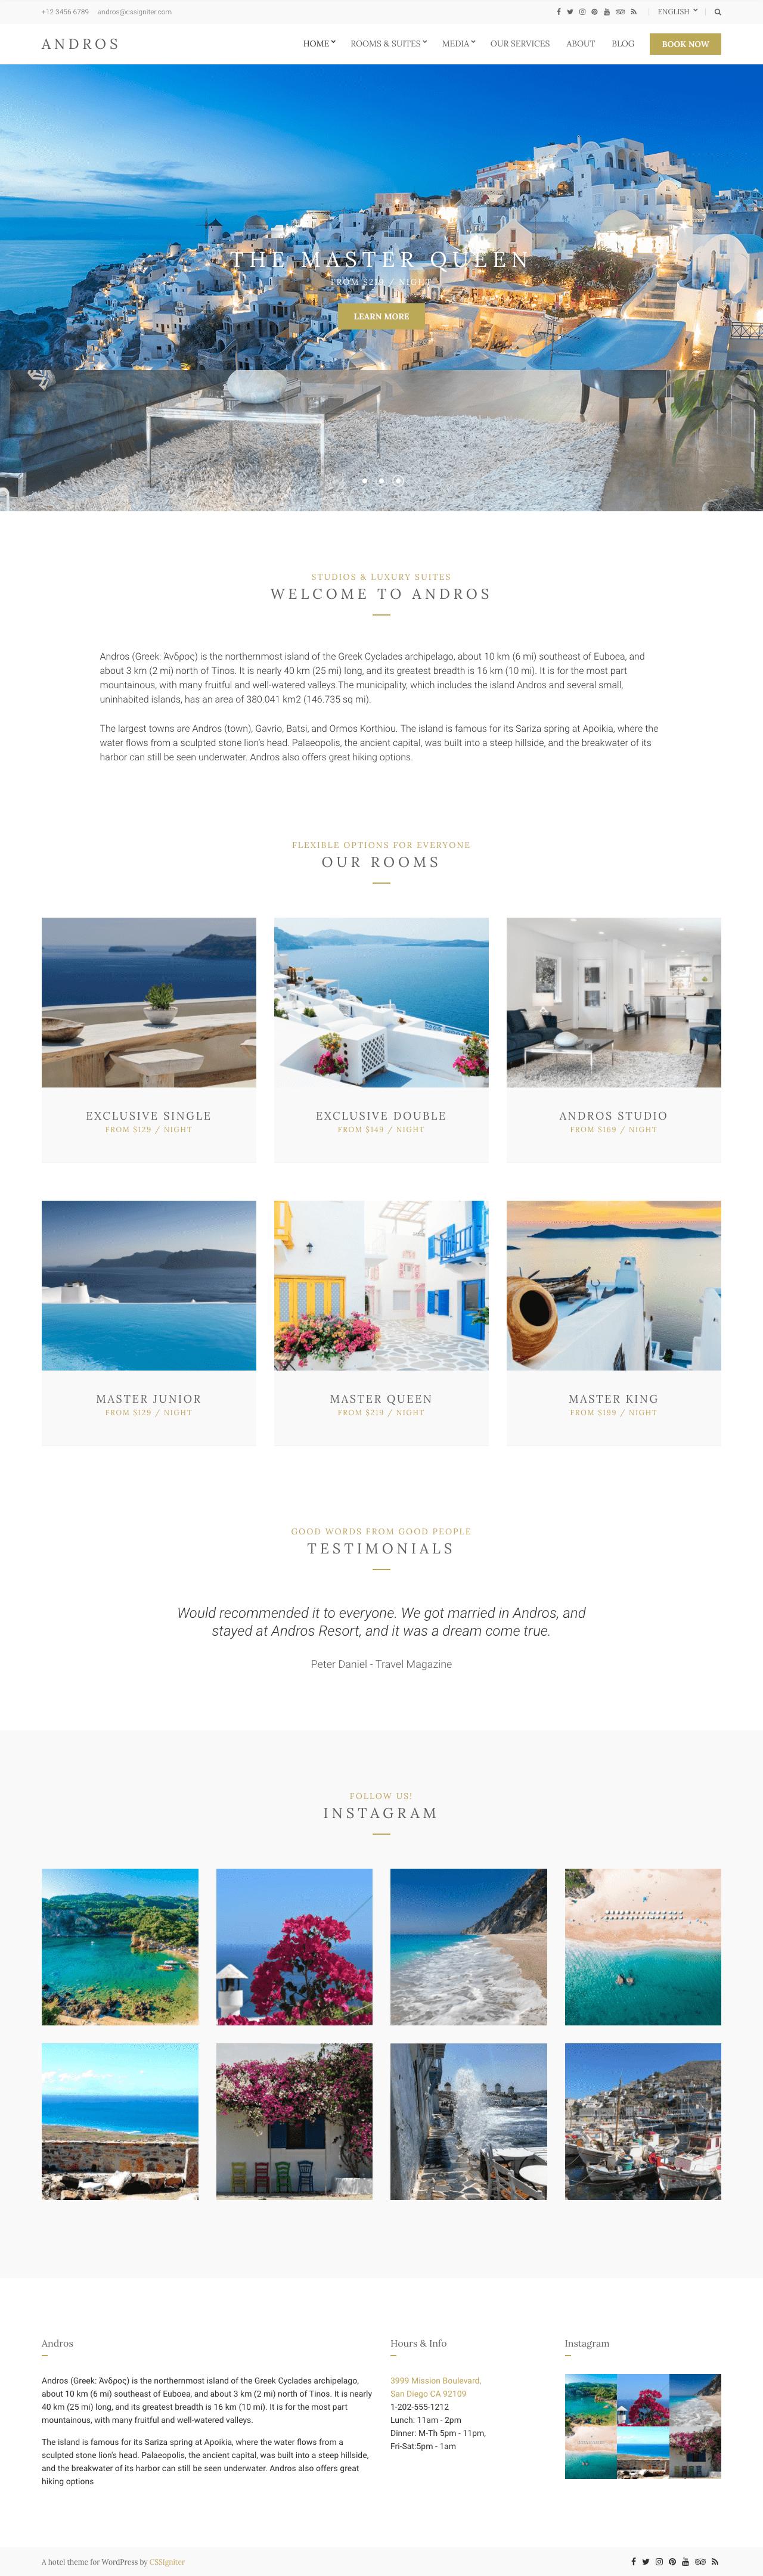 Andros responsive Hotel WordPress theme